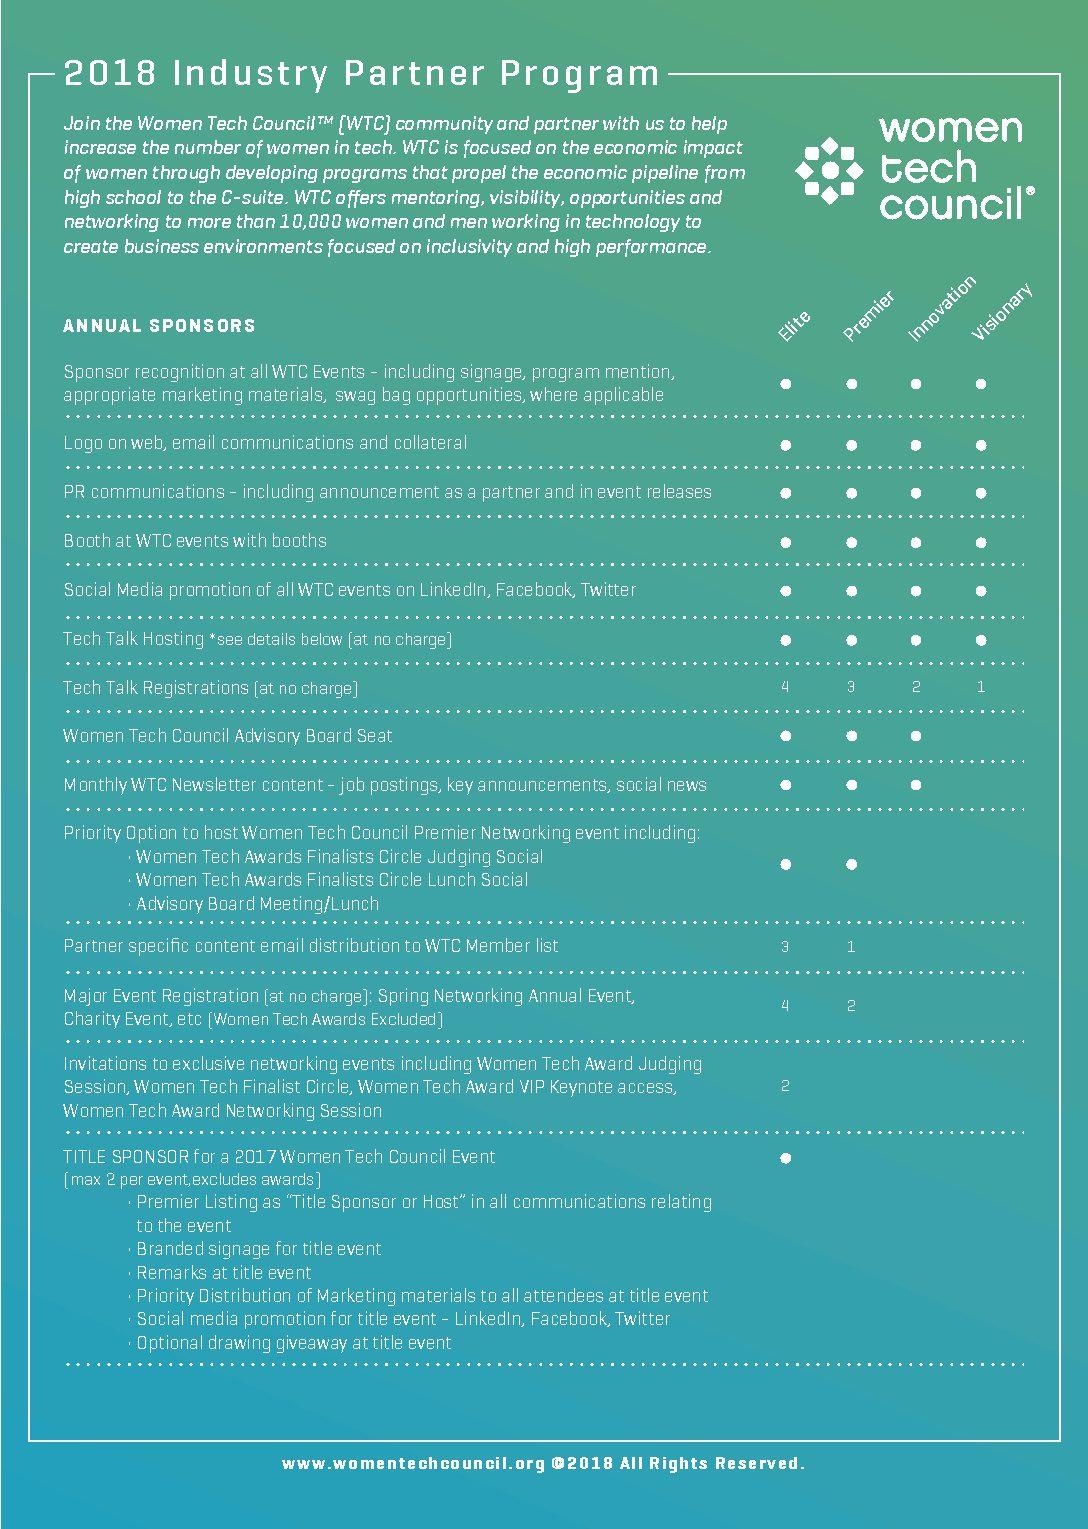 2018 Partner Overview_v1